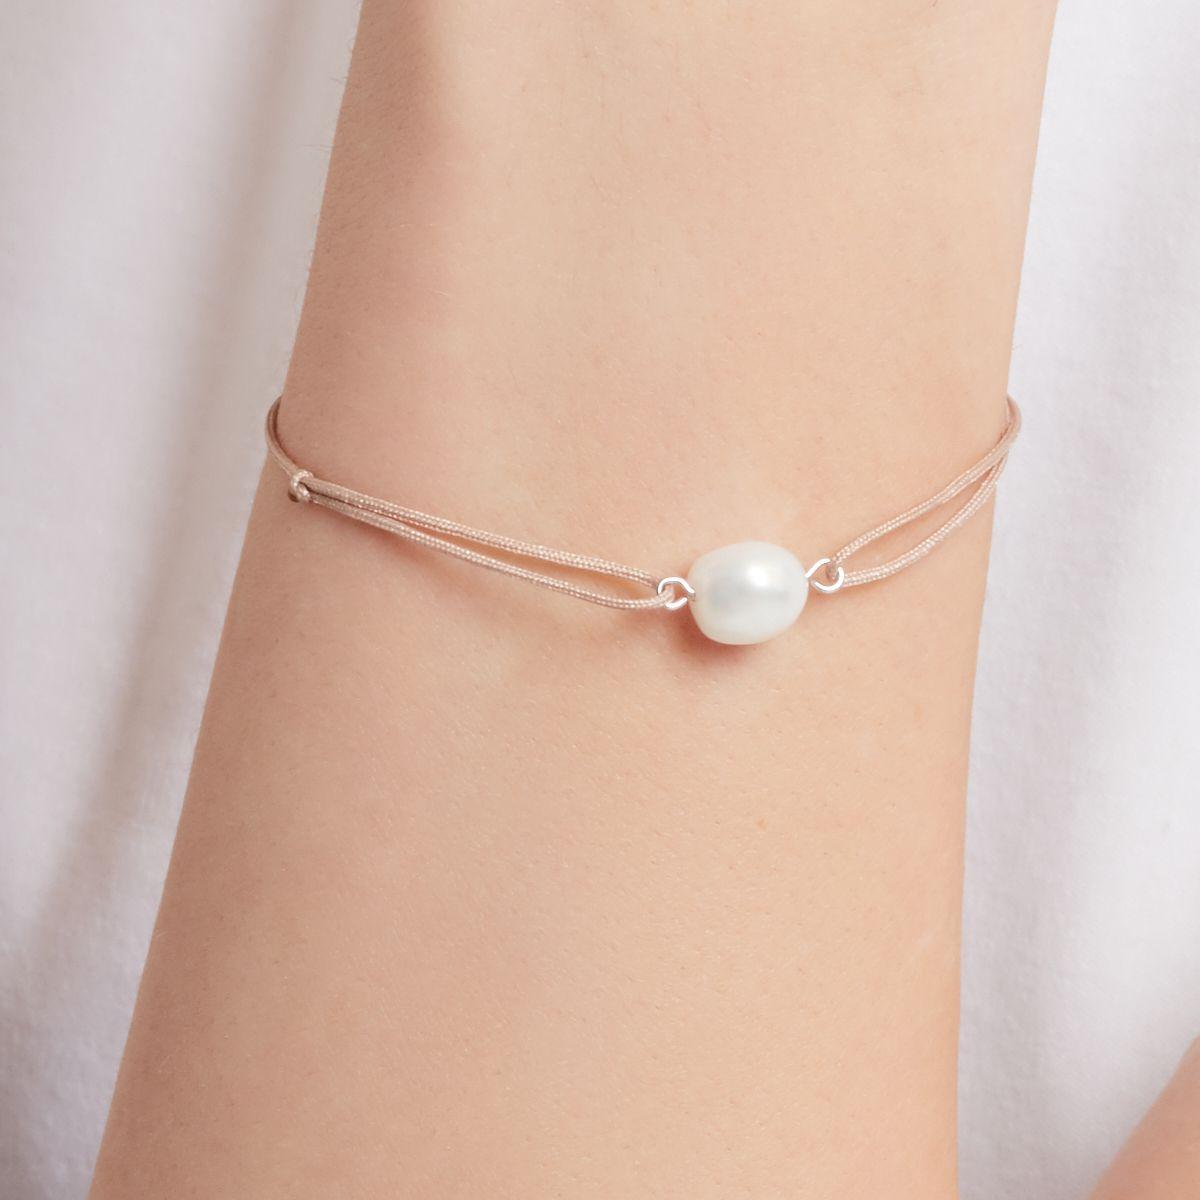 Ariel - Armband - Nude